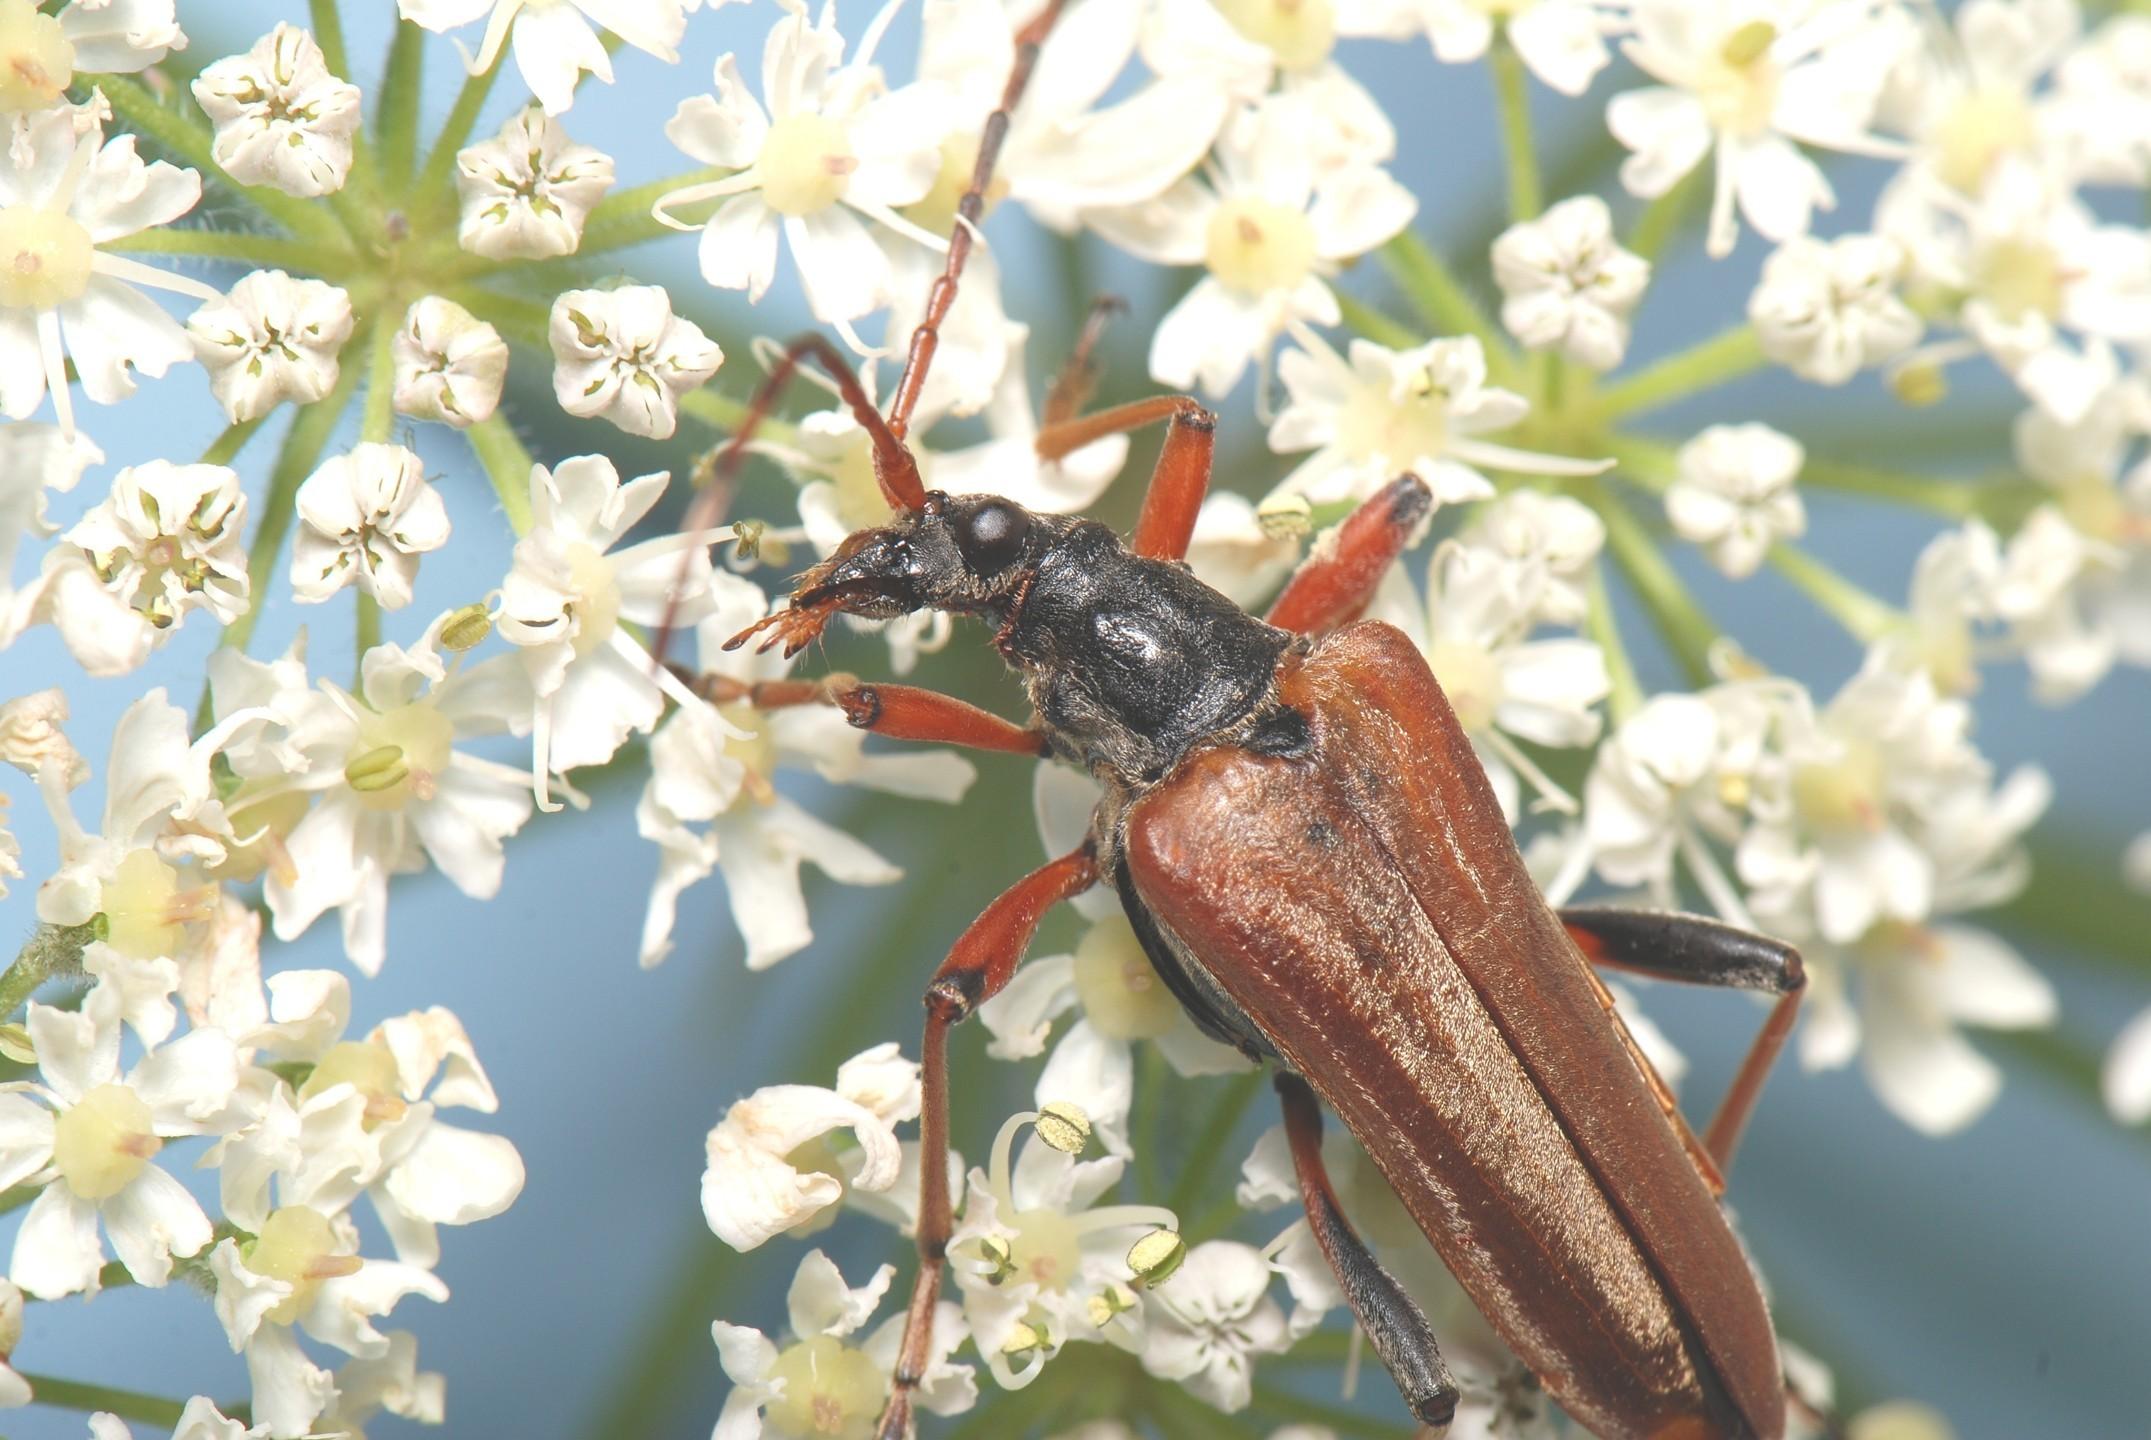 Stenocorus meridianus is another type of longhorn beetle.